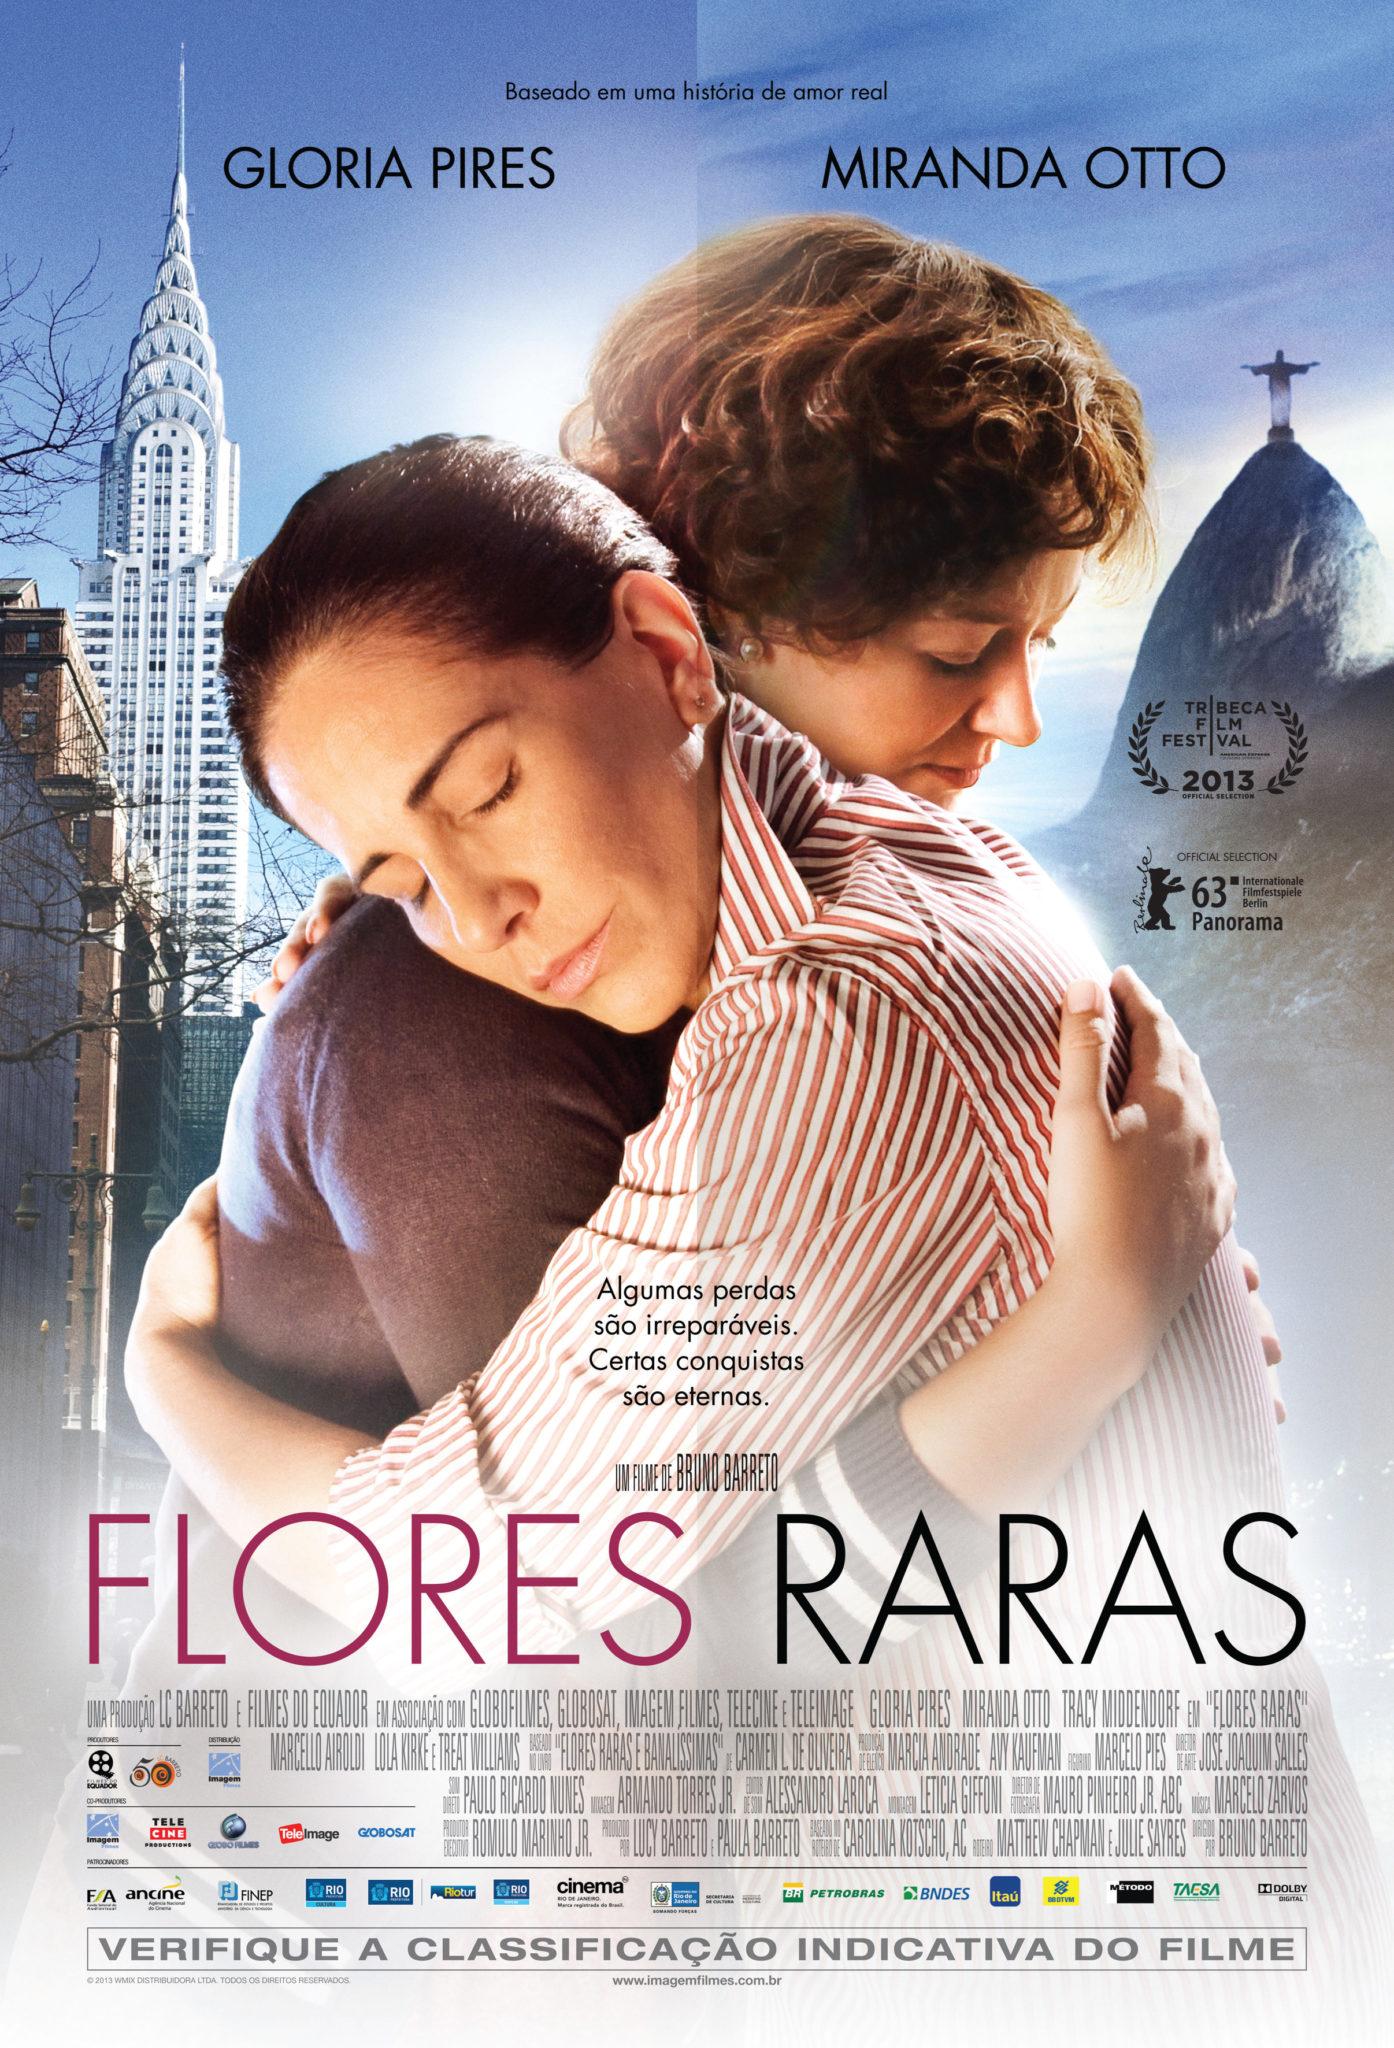 PosterCinema FloresRaras2a.indd